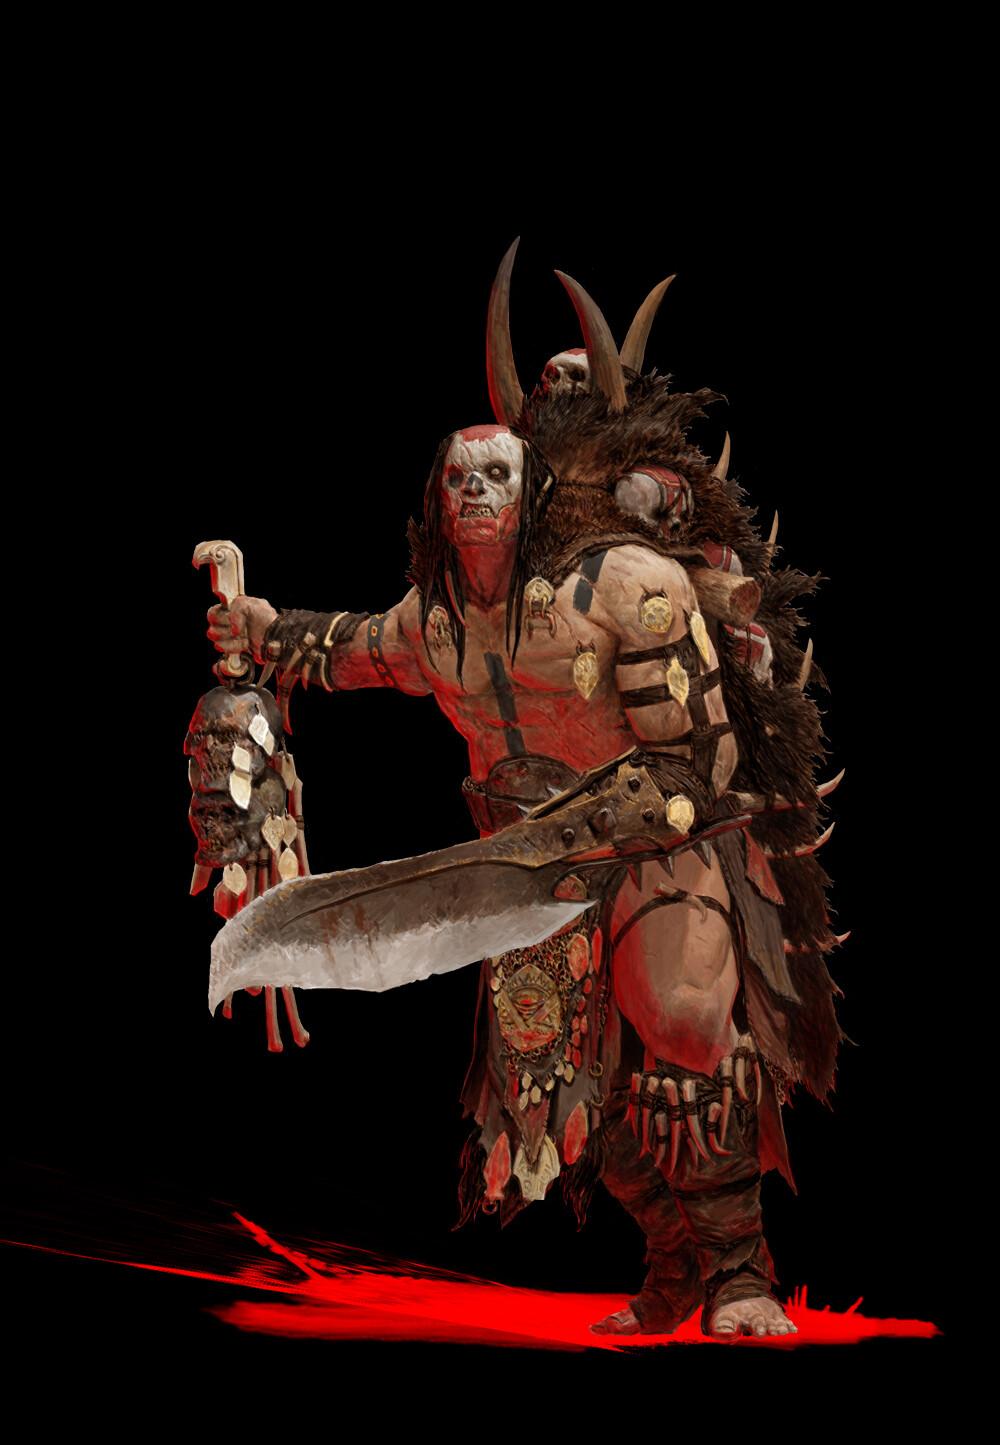 Adrian smith tribe3 shaman coloured